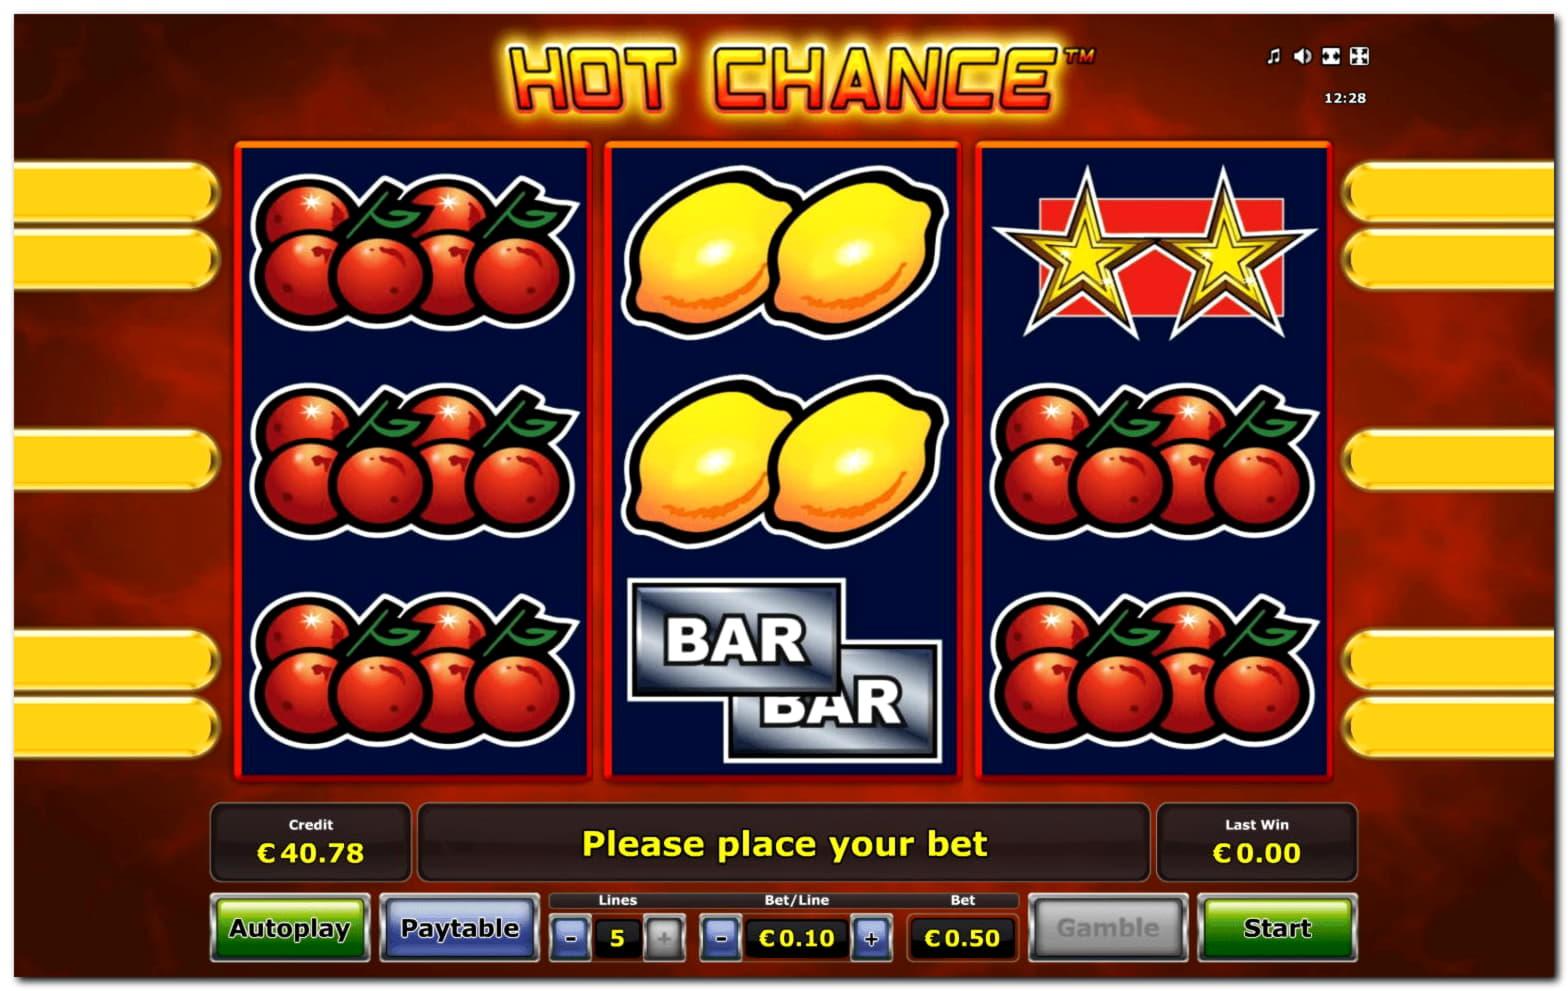 Buzzluck Casinoの€330無料カジノチップ